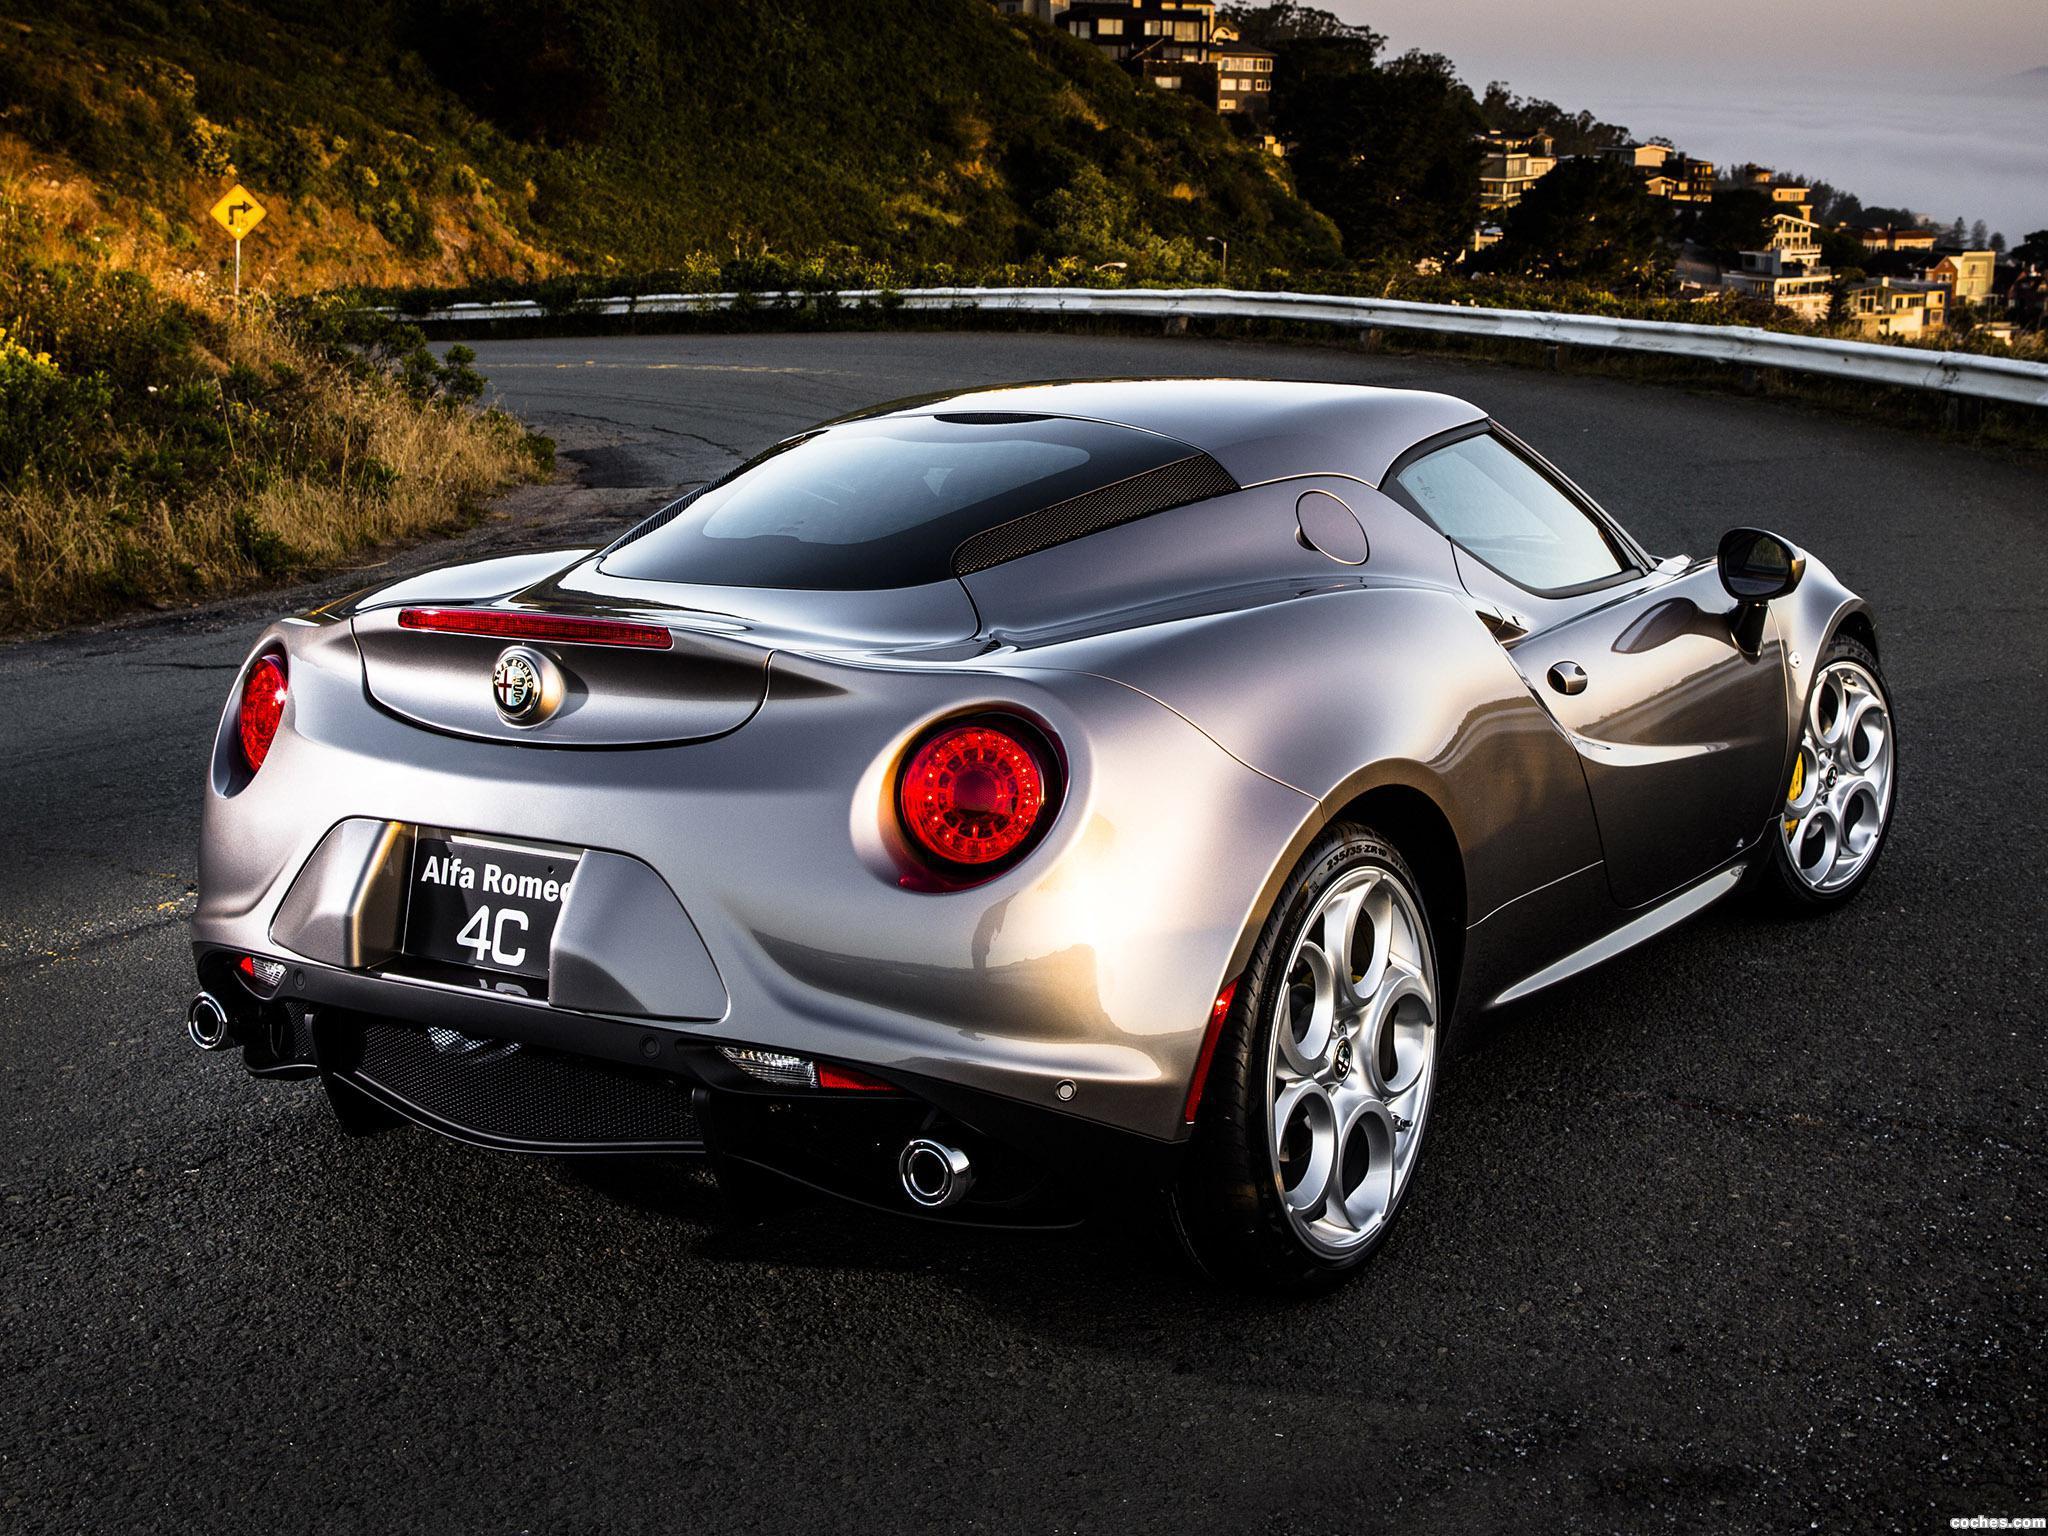 Foto 15 de Alfa Romeo 4C USA 2014